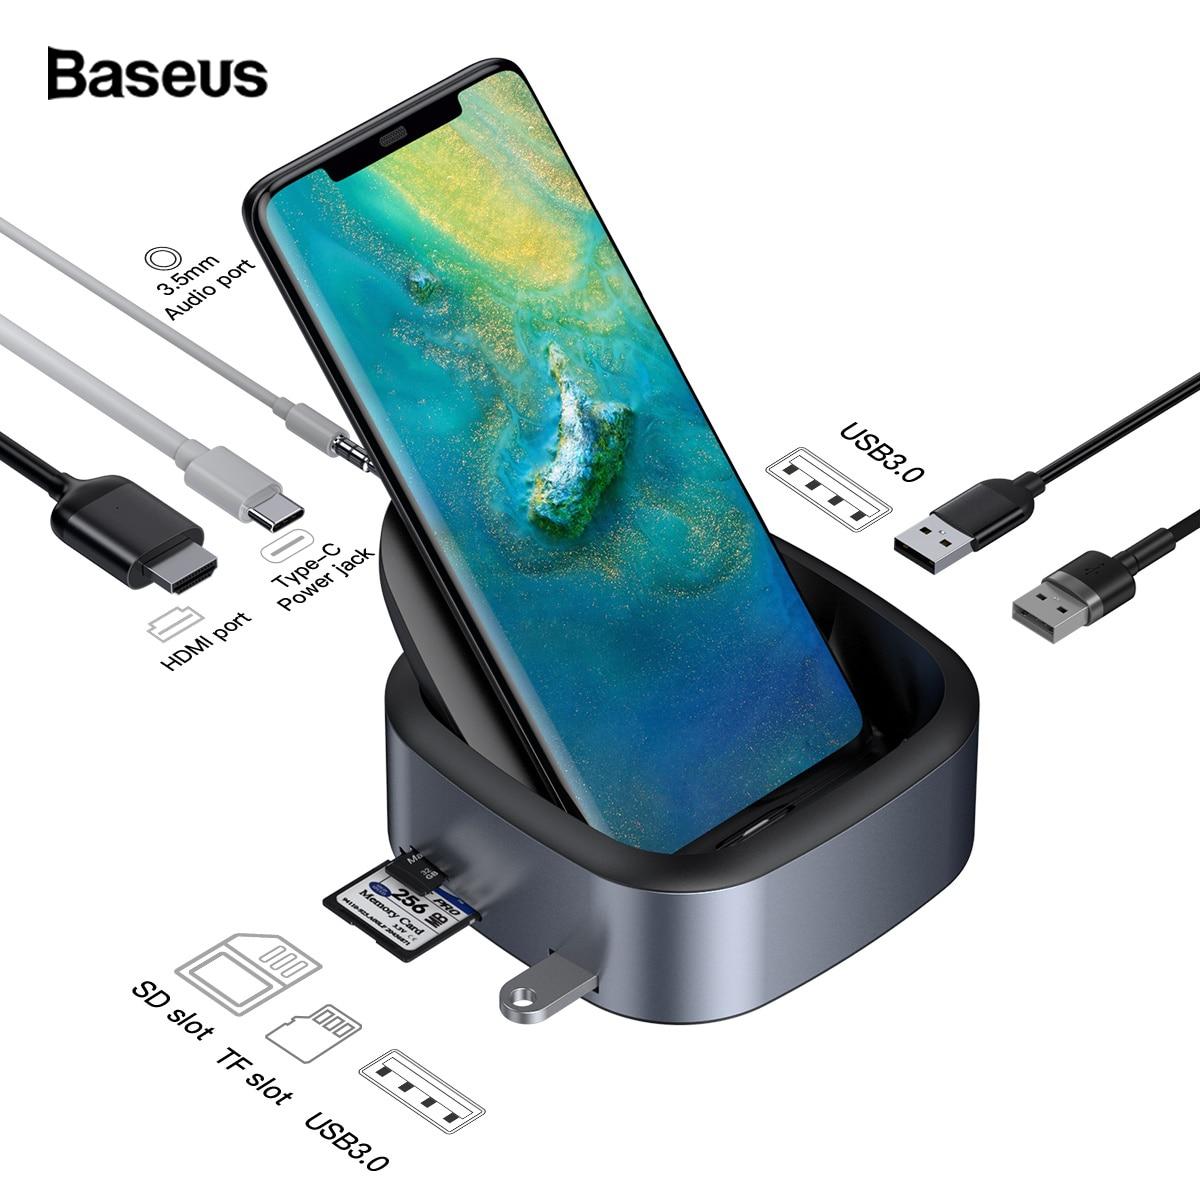 Baseus USB C HUB Docking Station Para Huawei P30 P20 Pro Samsung S10 S9 Dex Pad Tipo C para USB3.0 carregador Doca HDMI Jack 3.5 milímetros PD